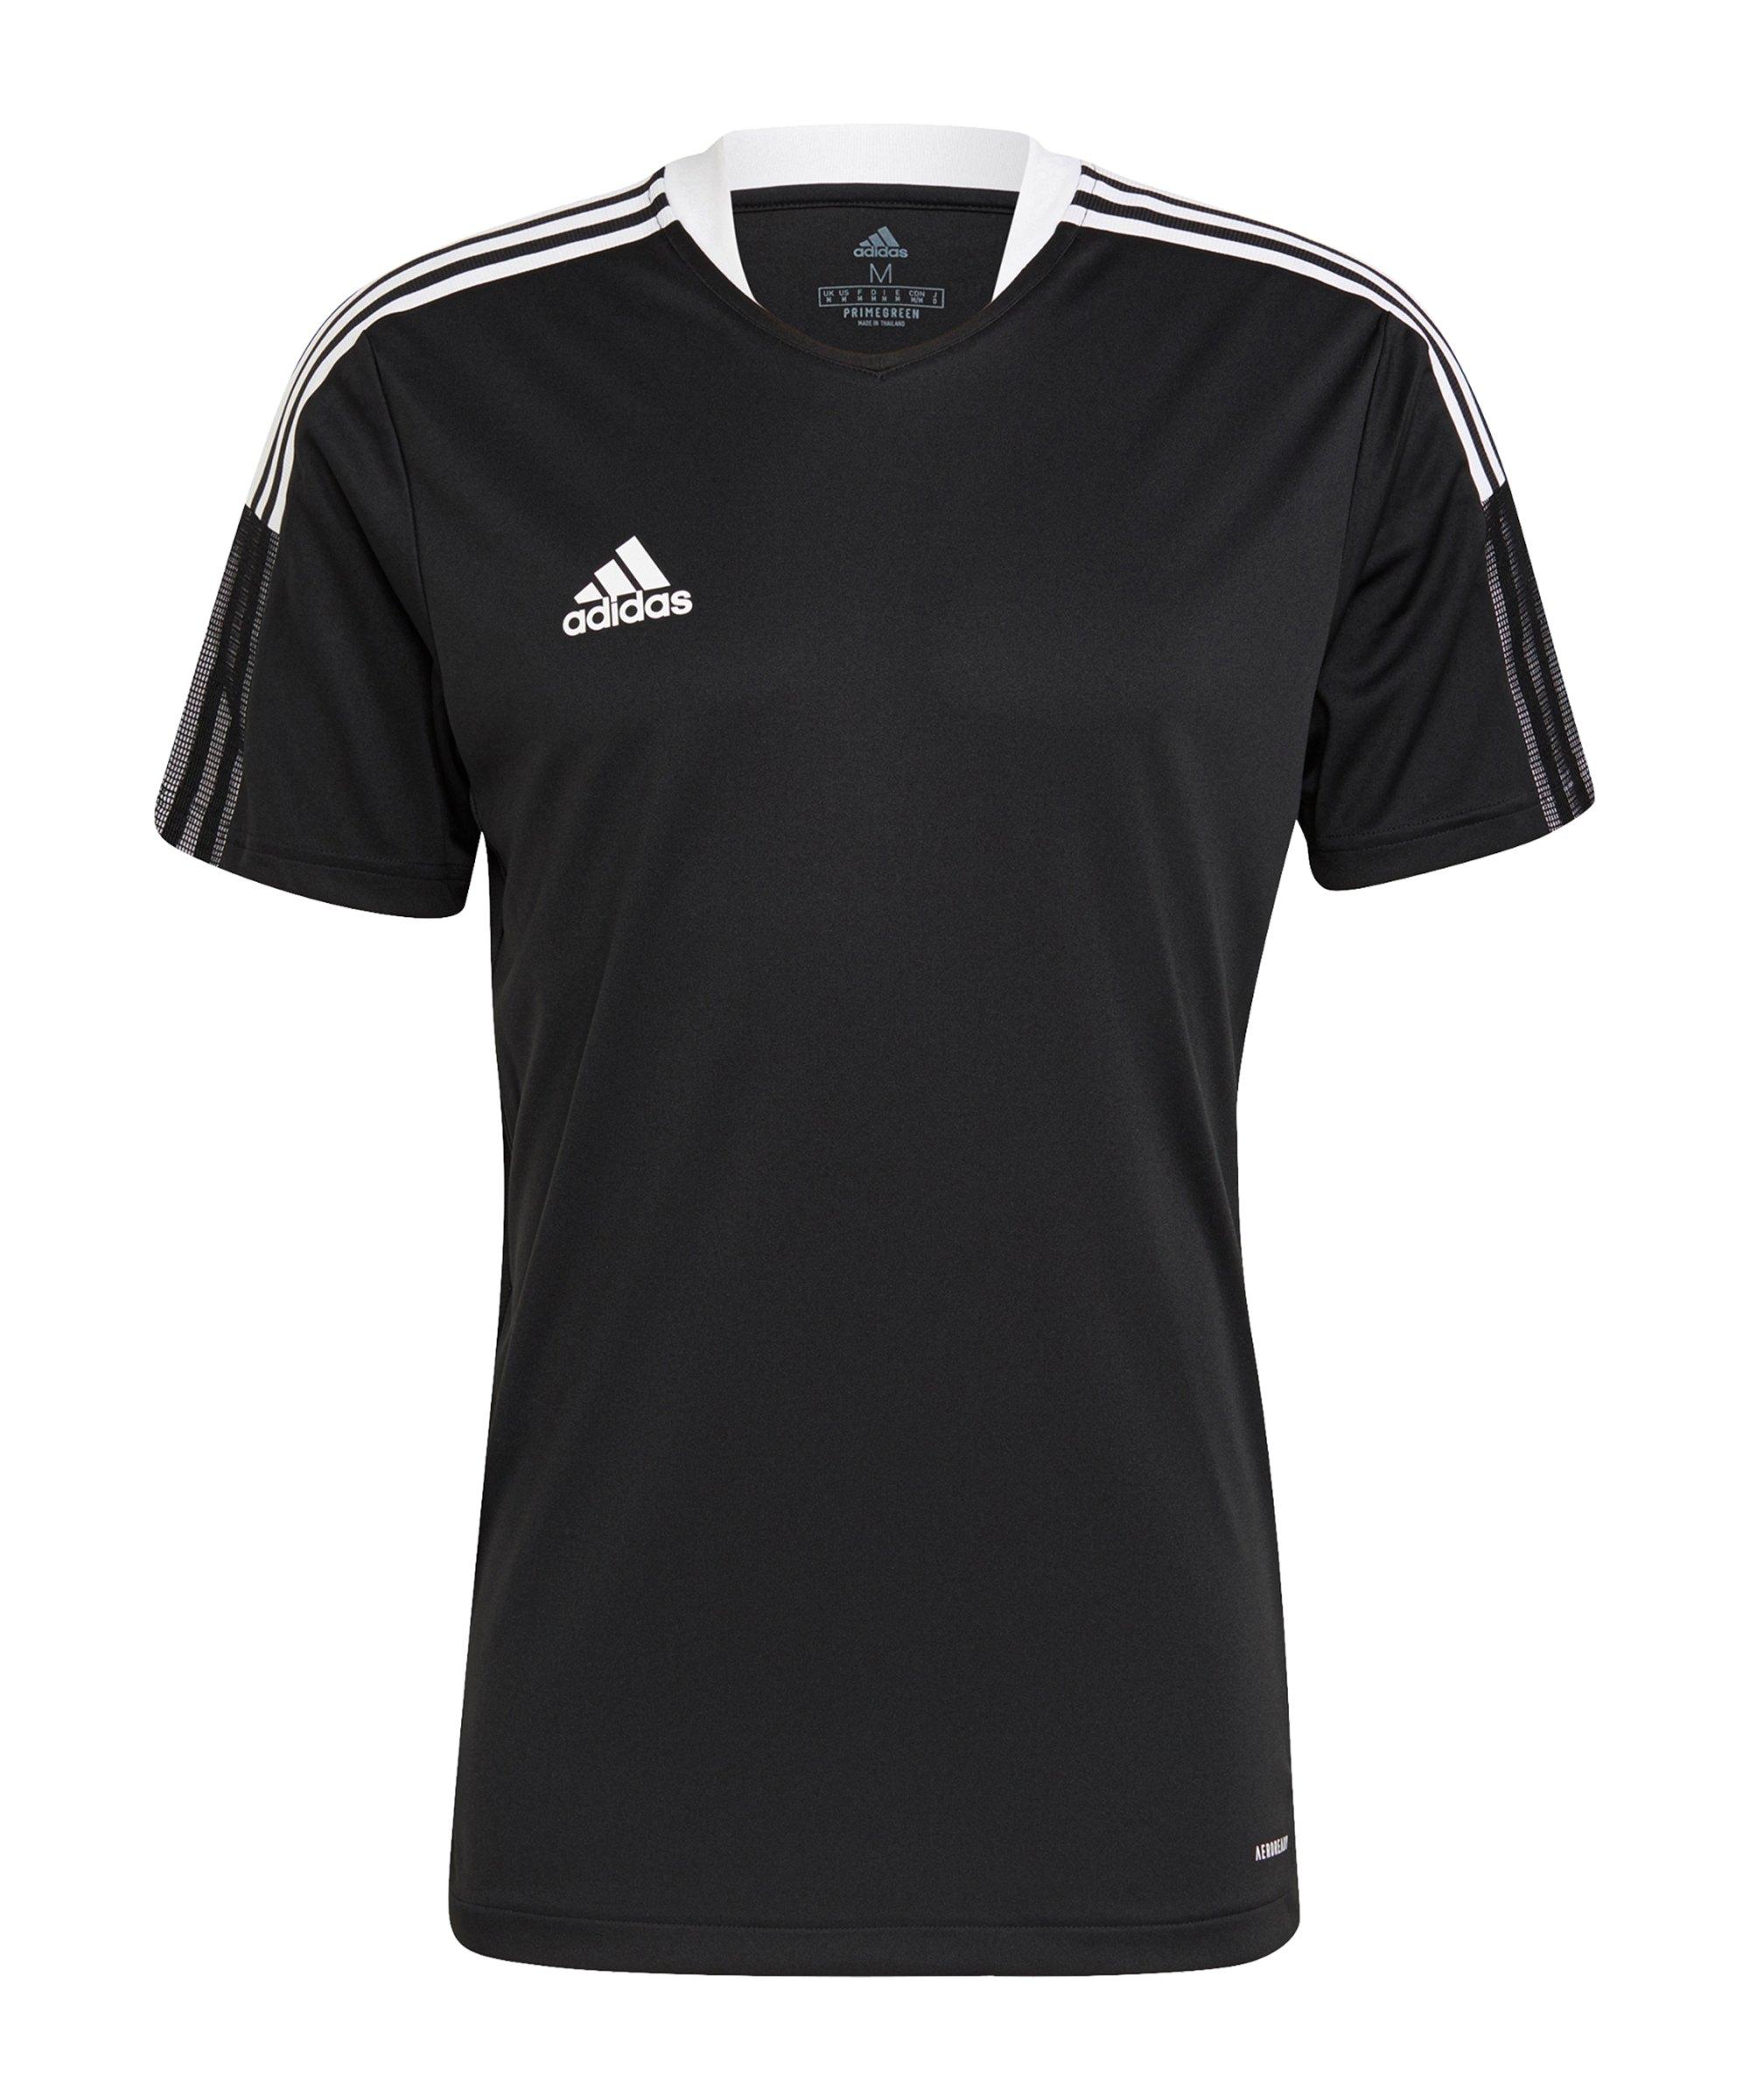 adidas Tiro 21 Trainingsshirt Schwarz - schwarz